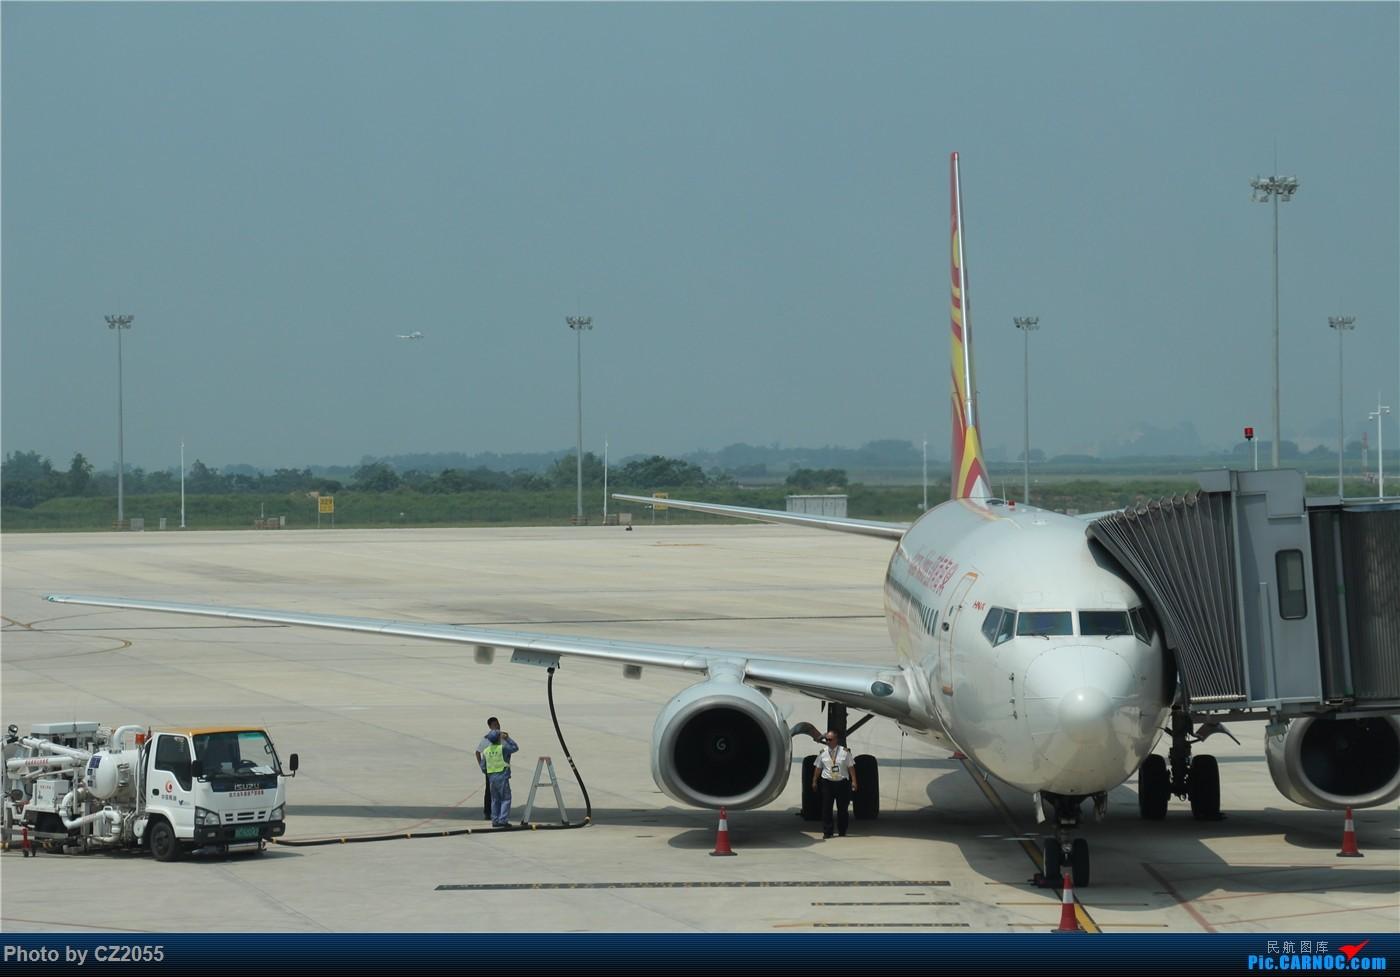 Re:[原创]【广东青少年拍机小队】【C-Z-2055(1)】Aug.8.2015 不期而遇,相伴相惜。首次体验SKYTRAX五星航空公司-海南航空。 BOEING 737-700 B-5062 中国南宁吴圩国际机场